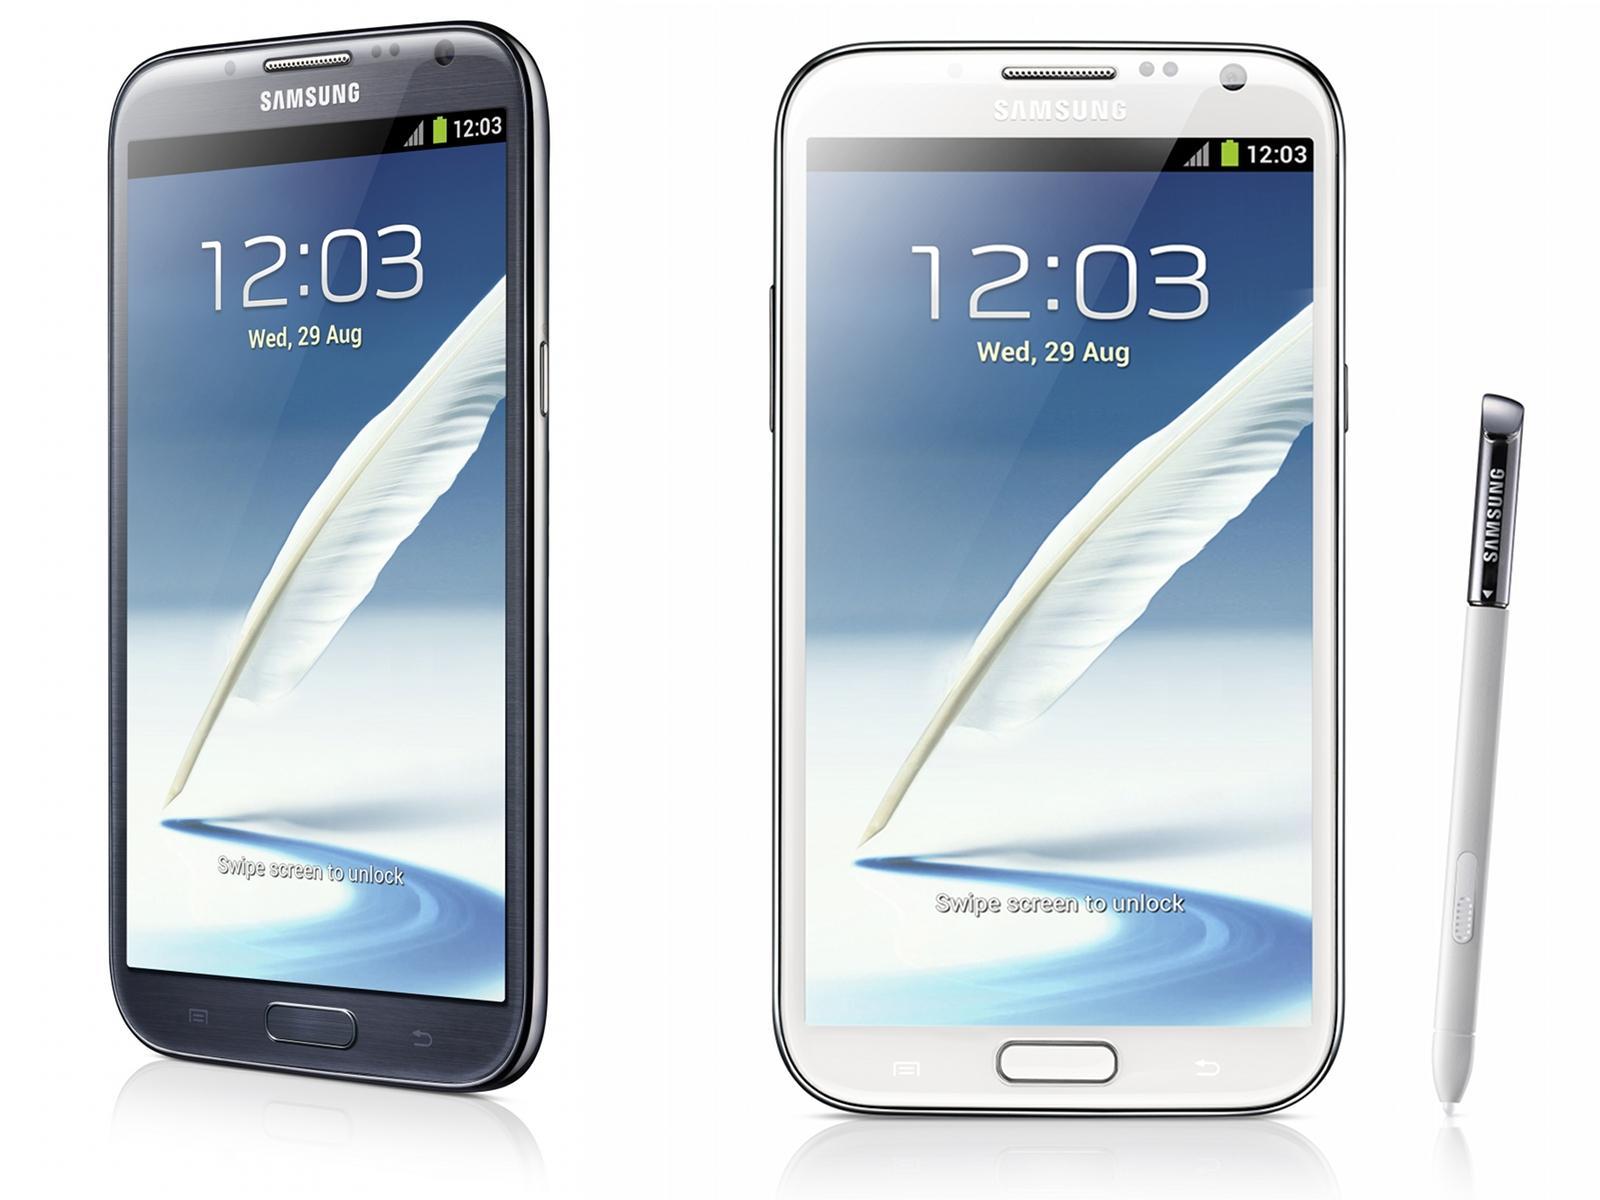 Samsung Galaxy Note 2 MediaWorld